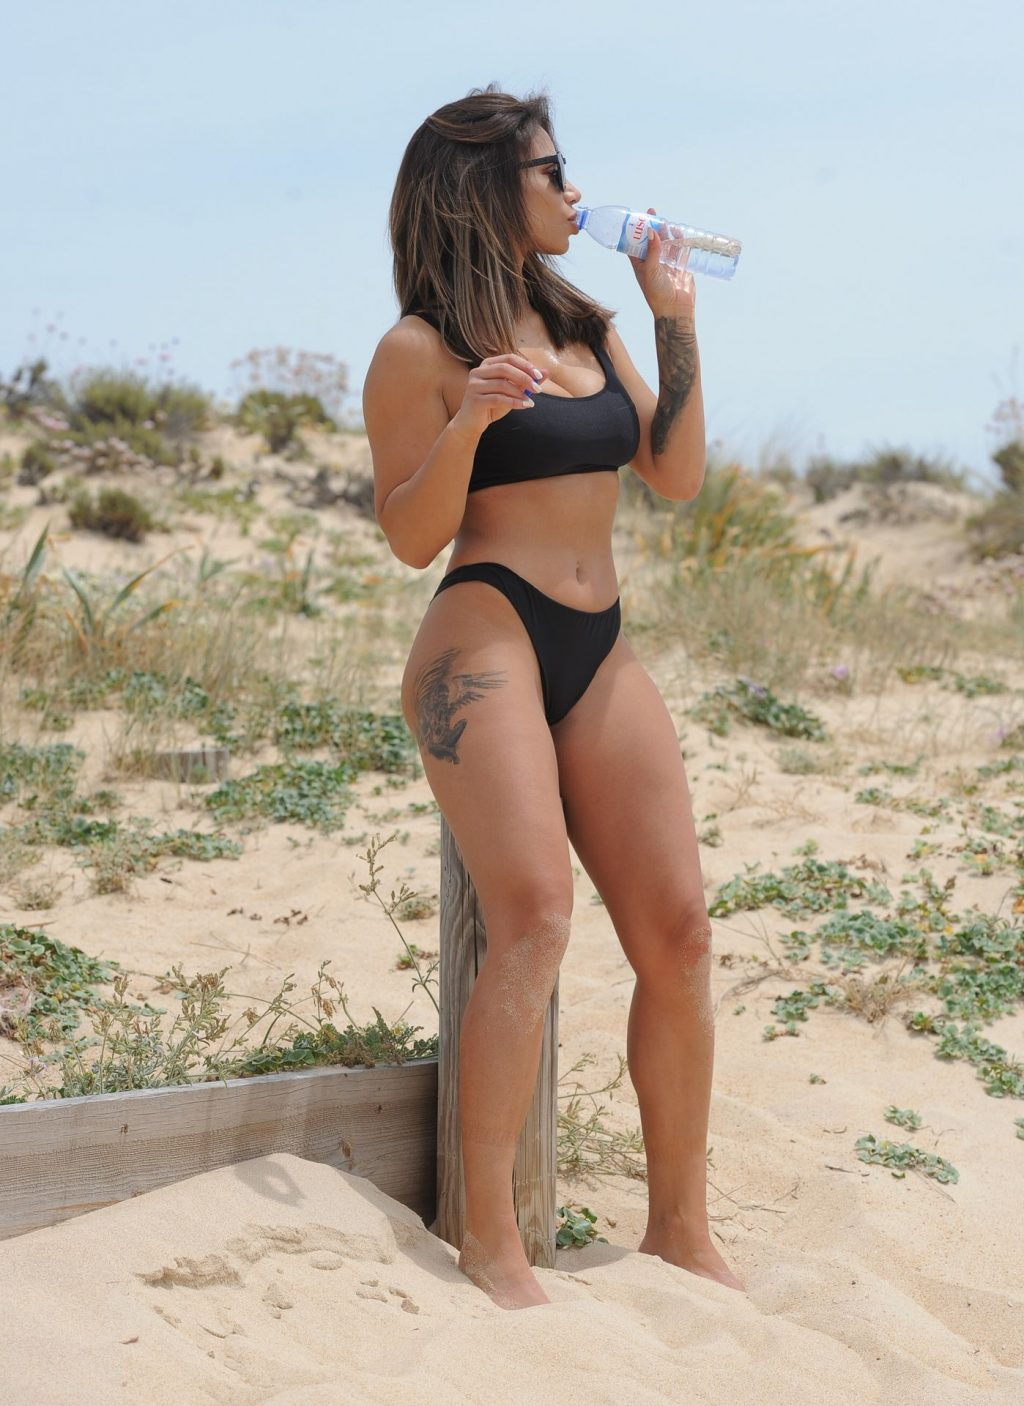 Kayleigh Morris Sexy (24 New Photos)